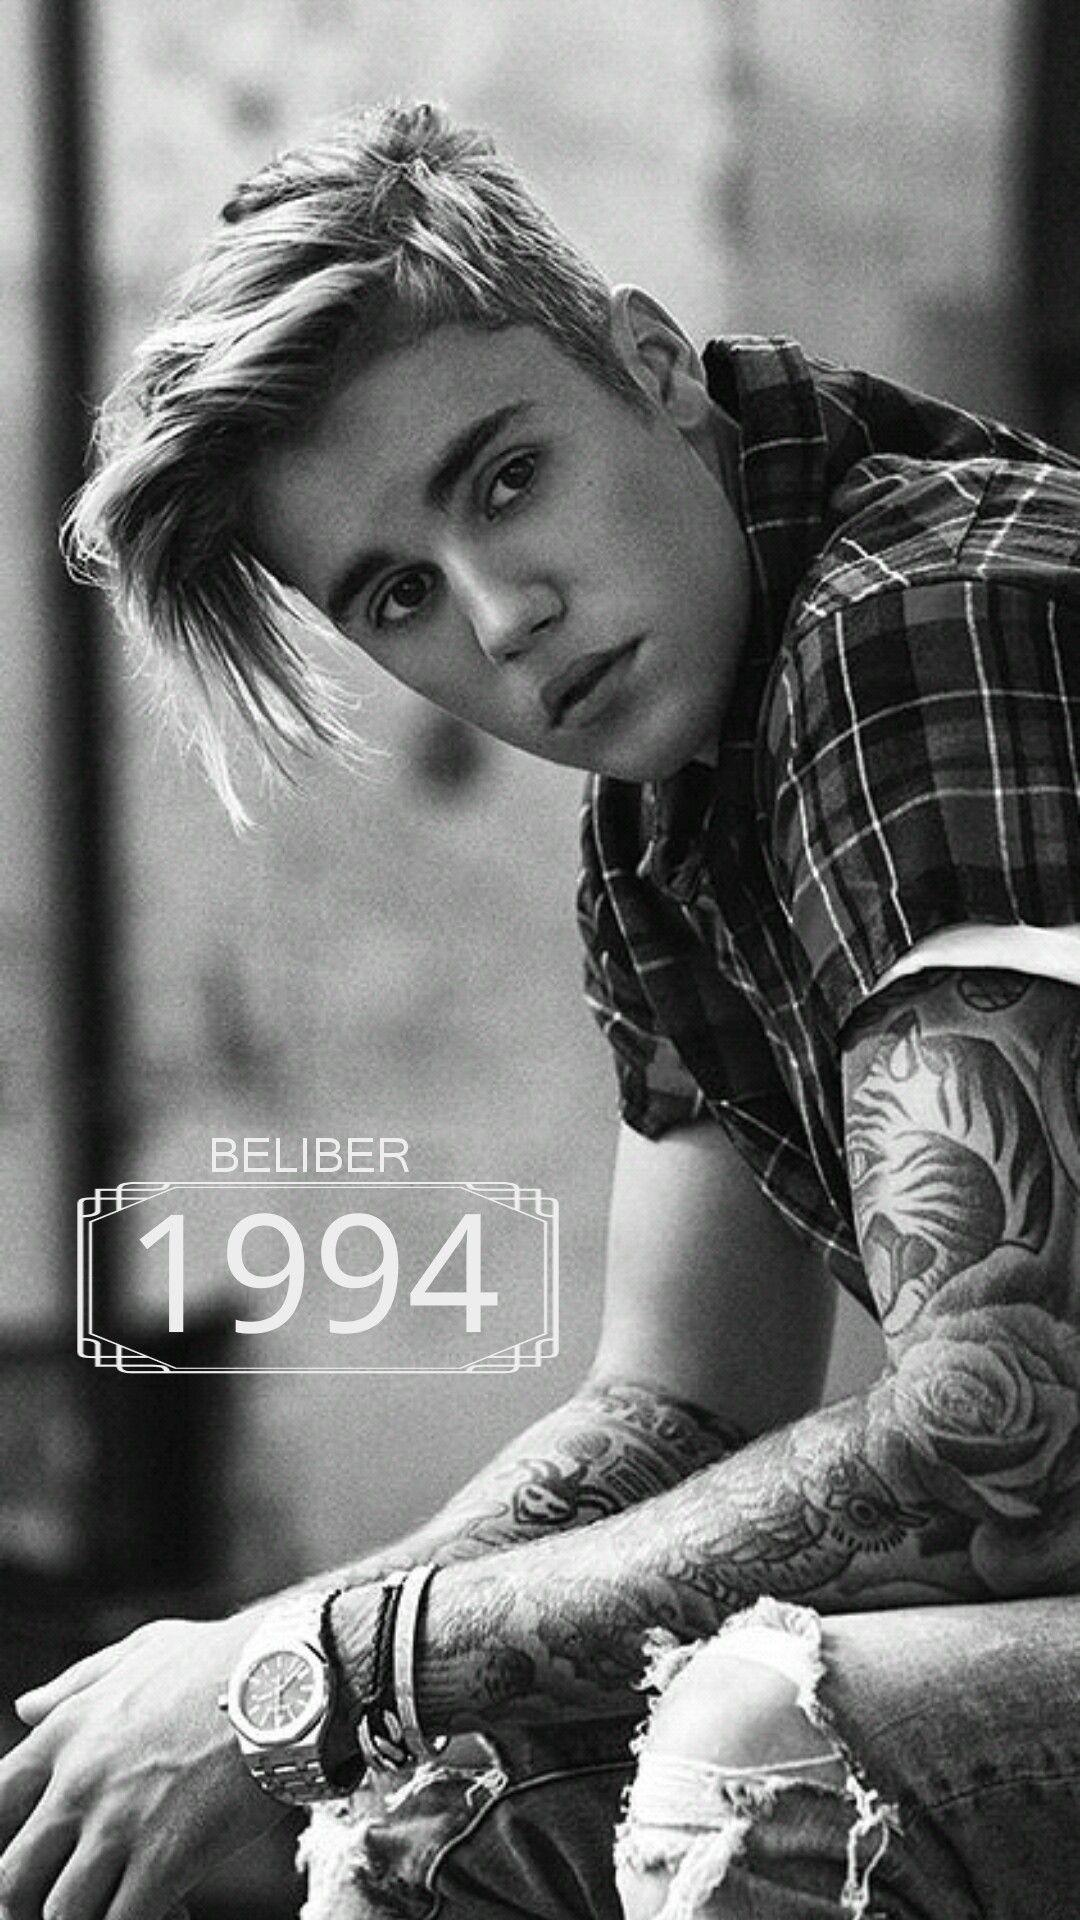 I Made This Justin Bieber Lockscreen Wallpaper Justin Bieber Photos Justin Bieber Pictures I Love Justin Bieber